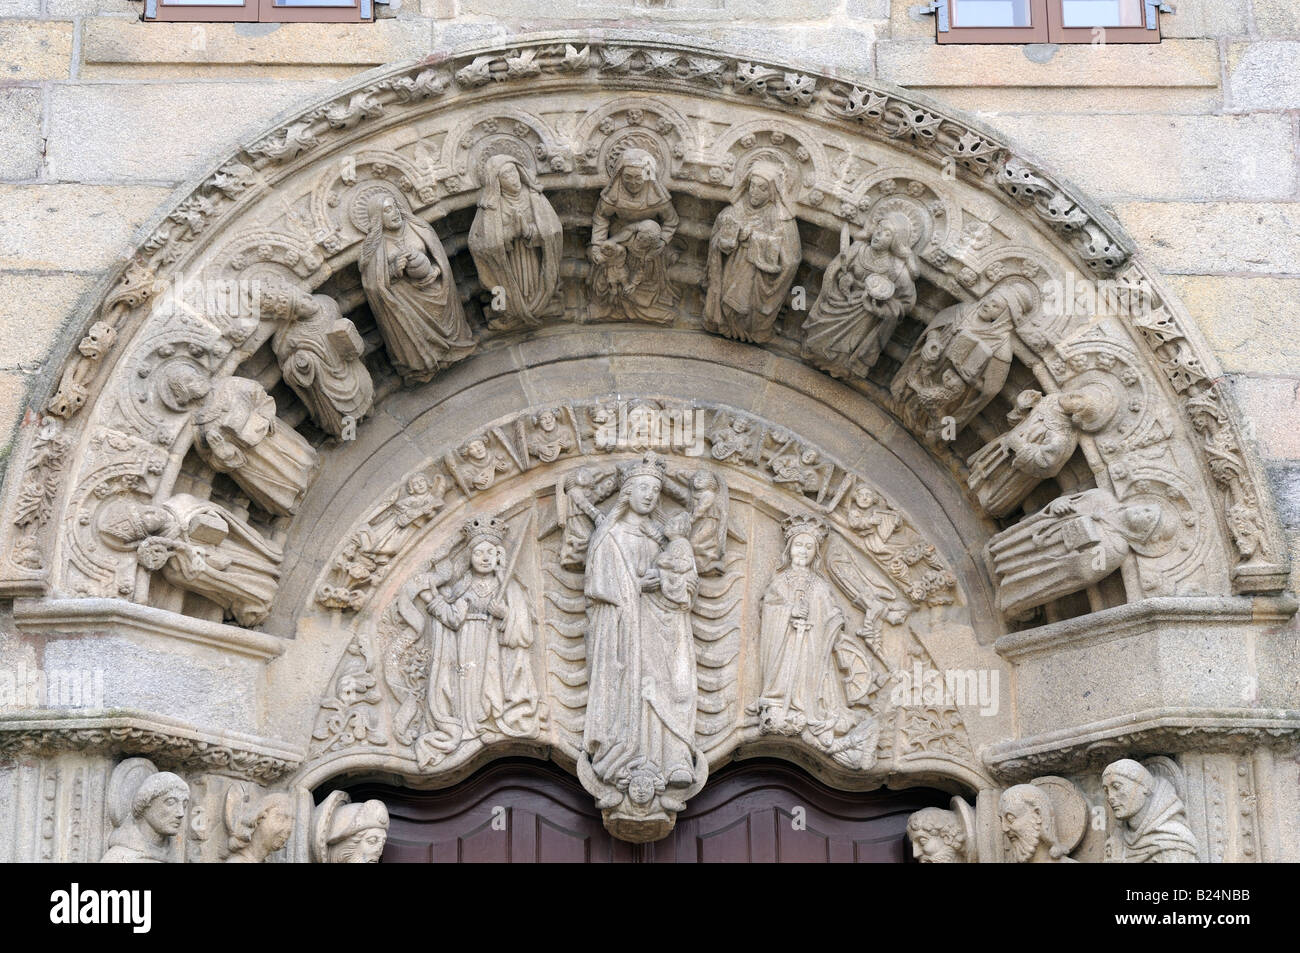 Portal of Colegio de San Xerome (17th century), Santiago de Compostela, Galicia, Spain Stock Photo